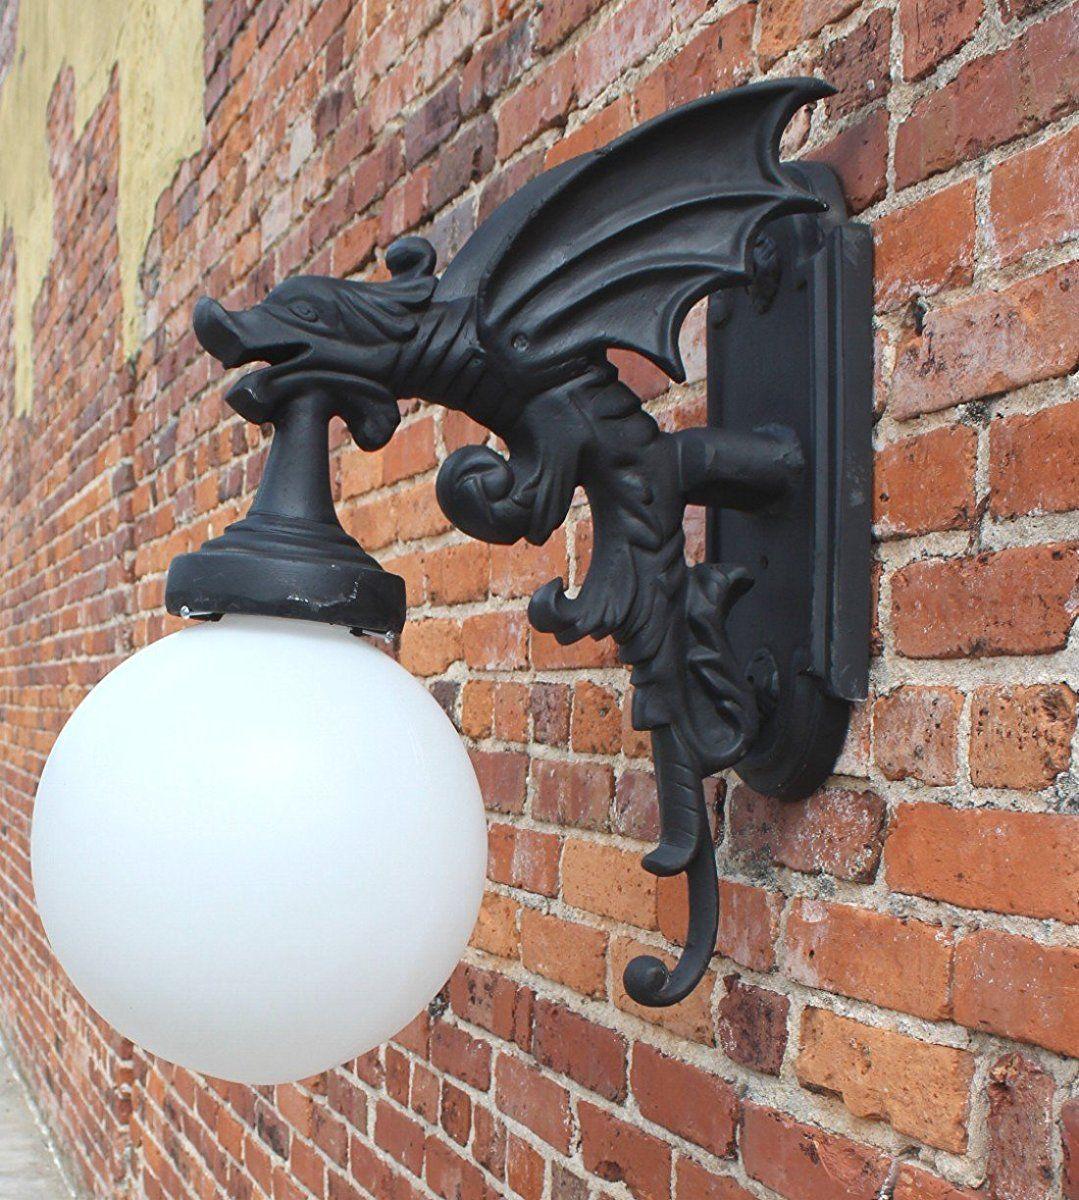 The Kings Bay Gargoyle Dragon Wing Outdoor Wall Light Fixture Outdoor Wall Light Fixtures Outdoor Wall Lighting Wall Lights